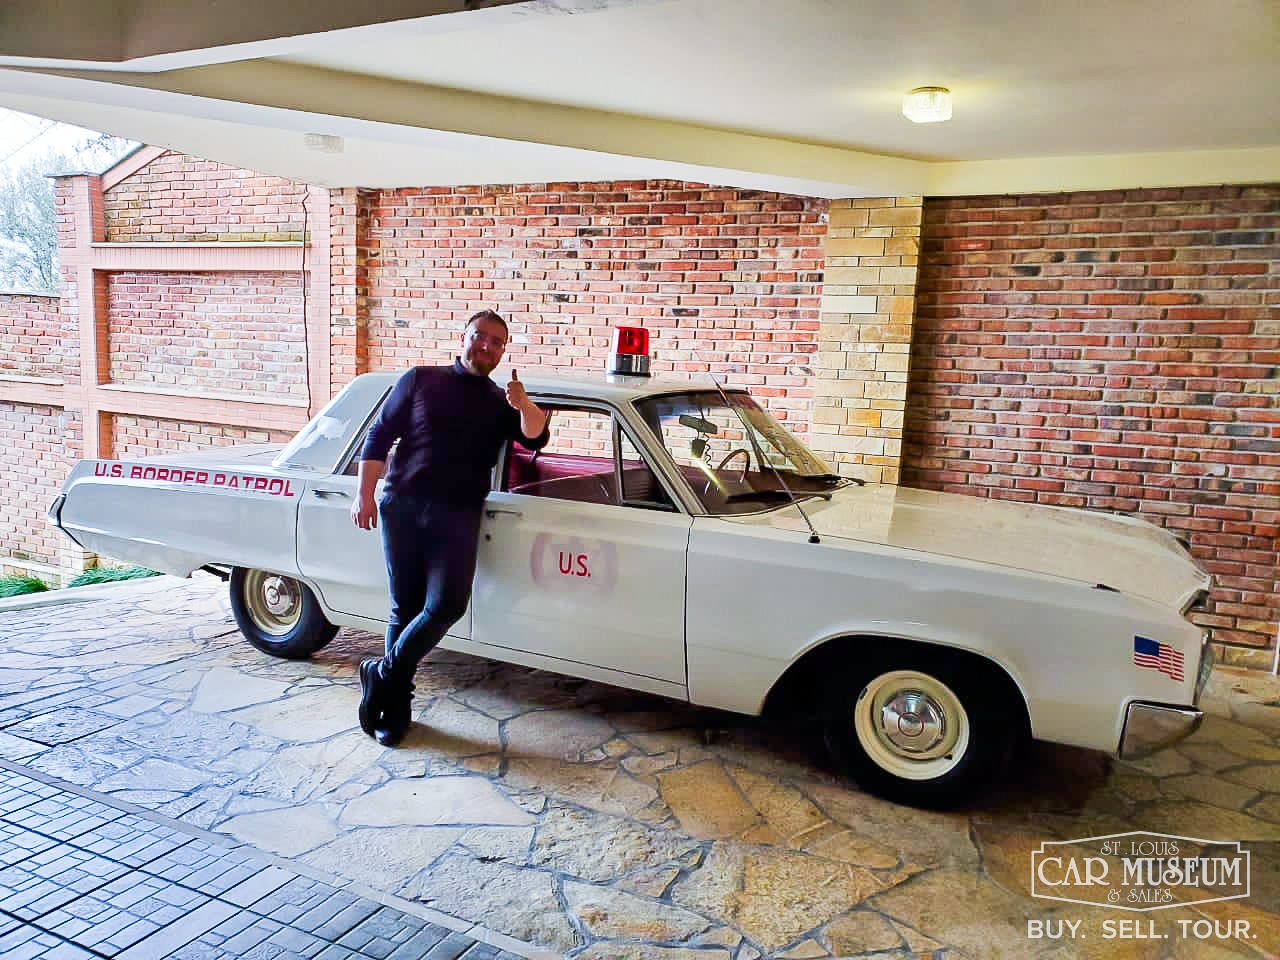 1967 Dodge Polara sold at the St. Louis Car Museum